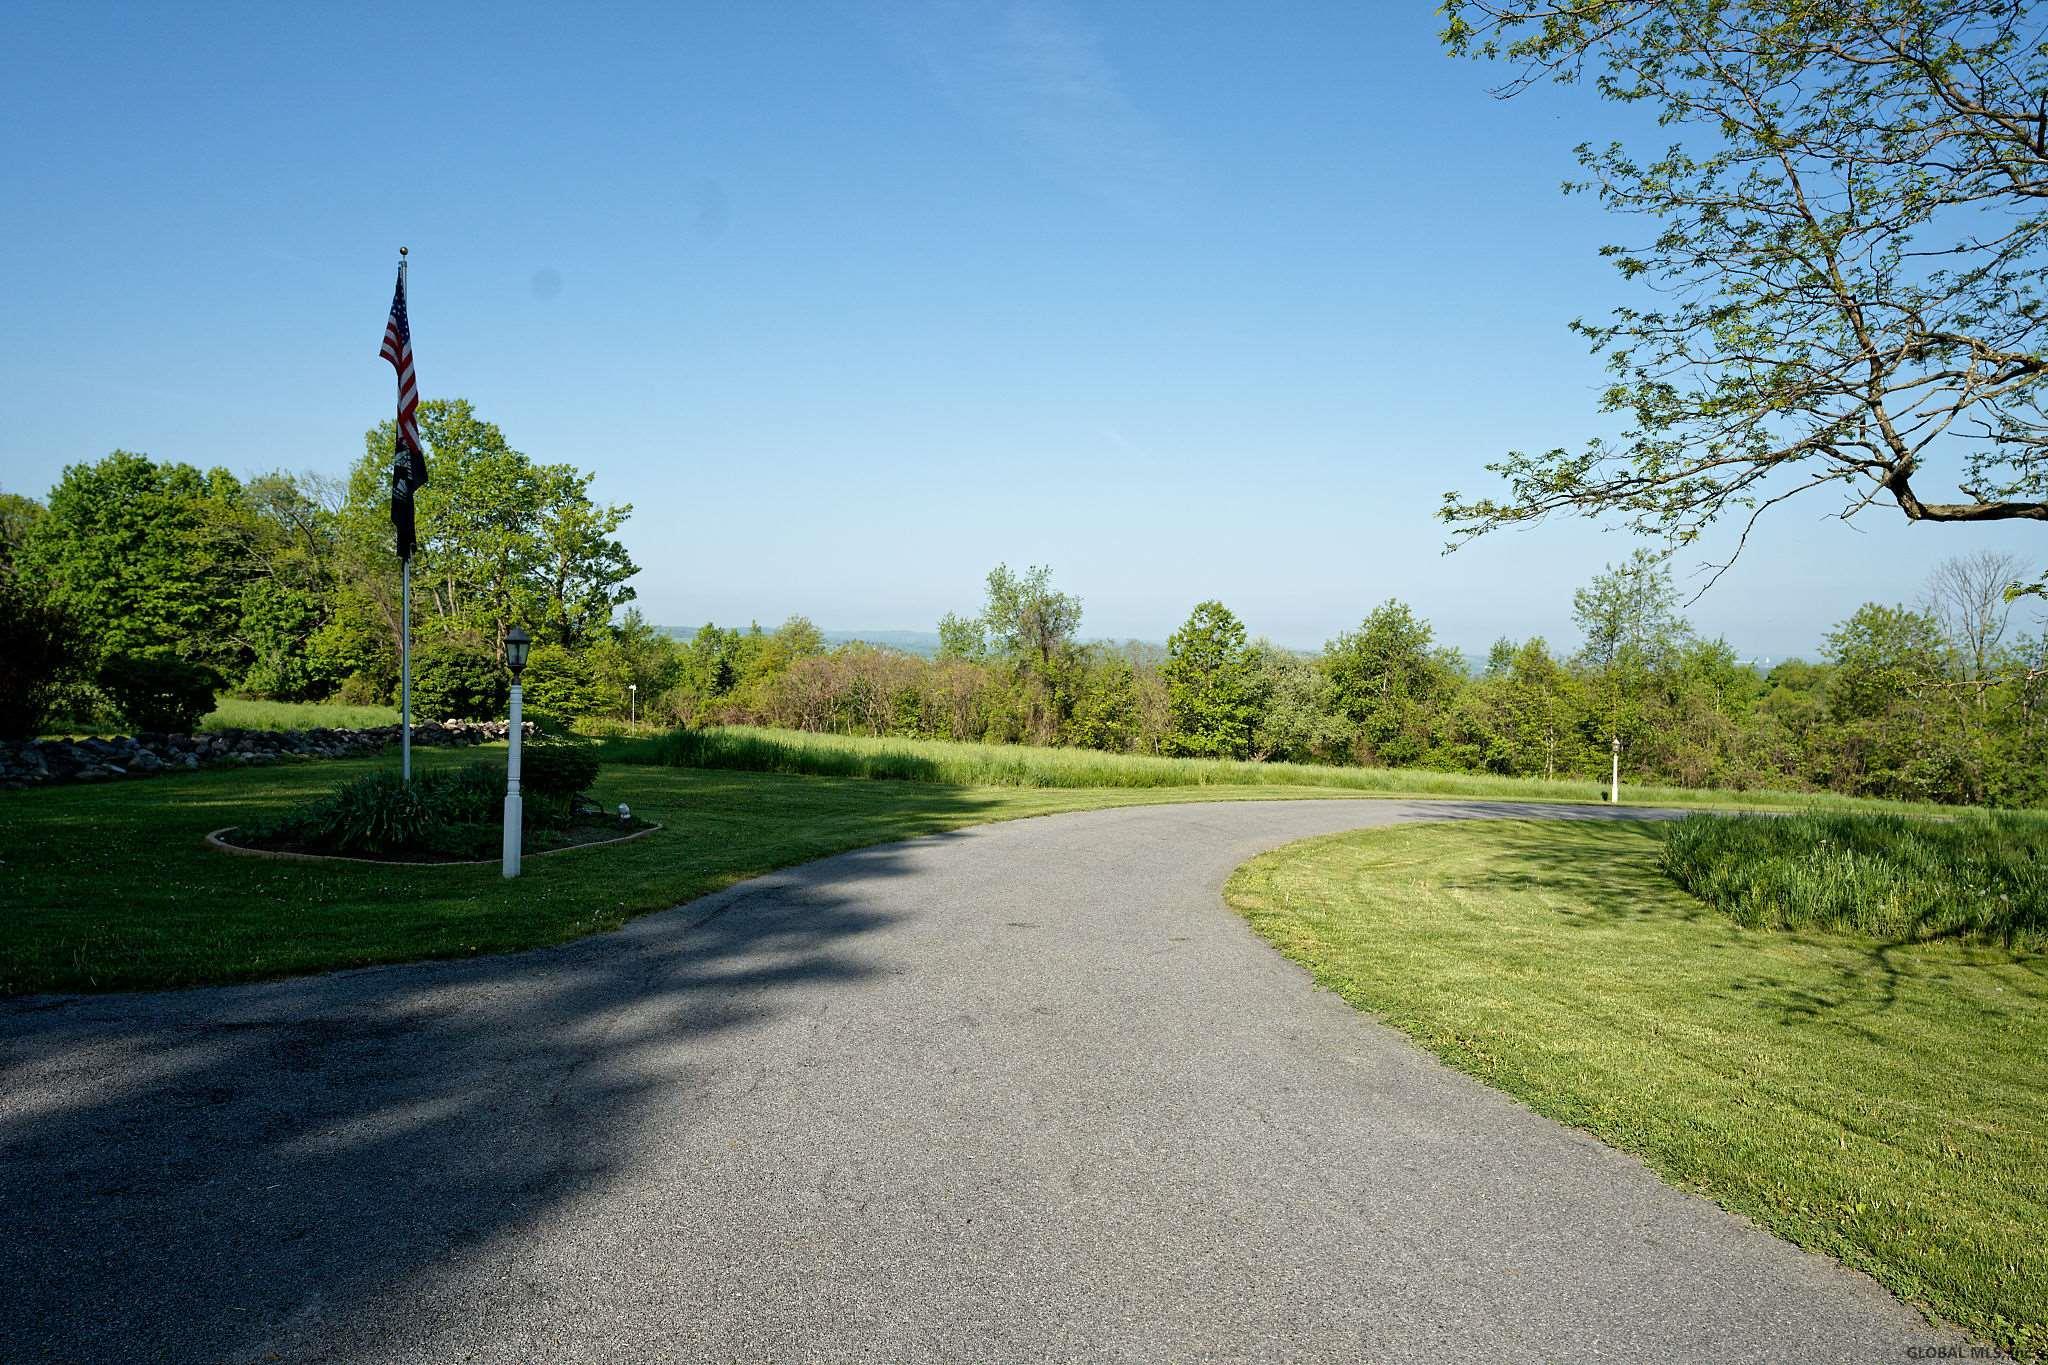 Glenville image 6